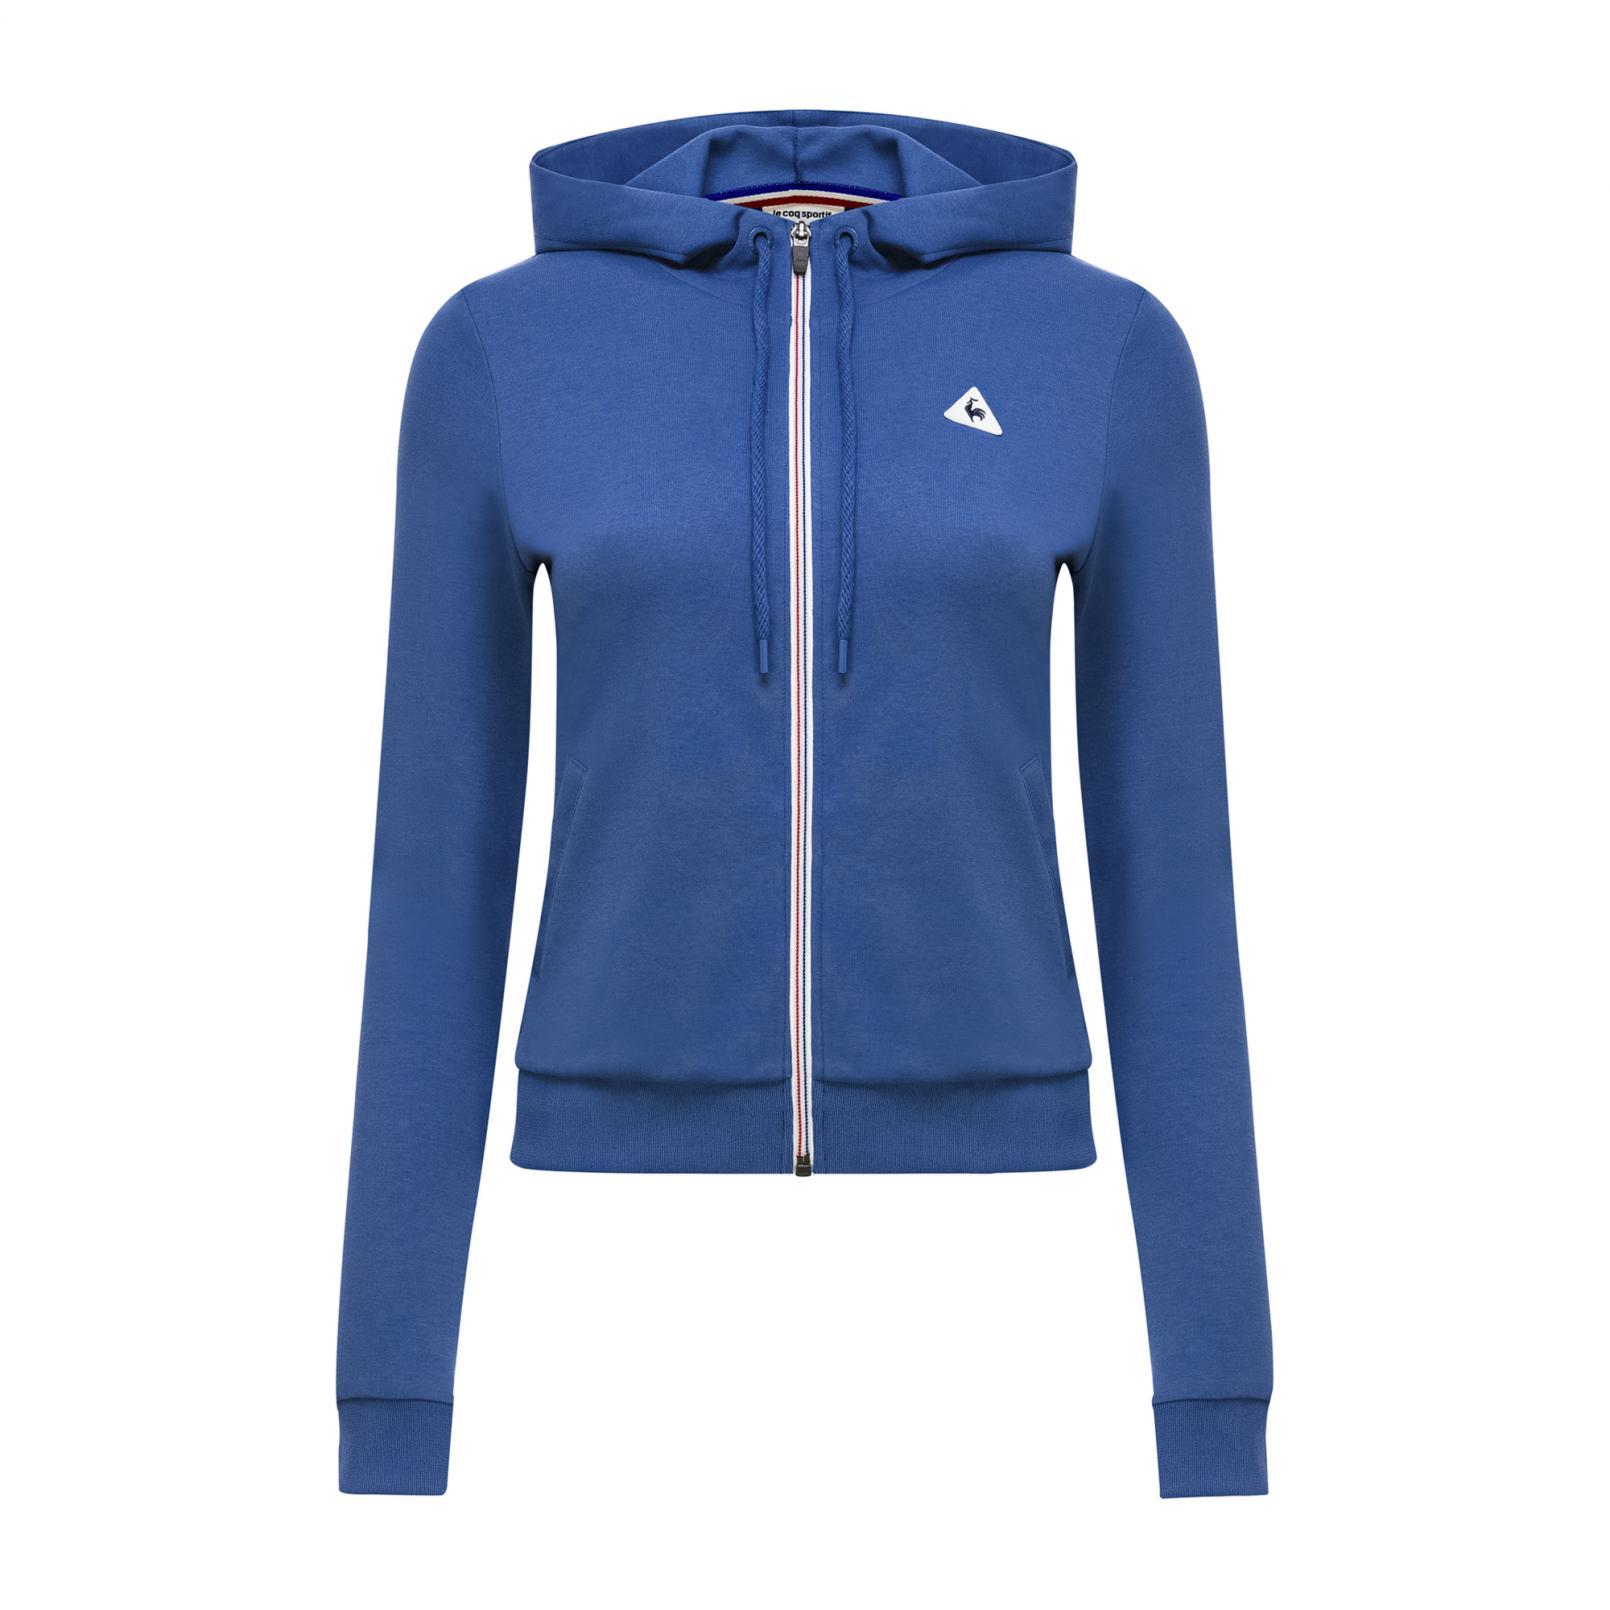 Sweatshirts & Hoodies – Le Coq Sportif Essentiels Pull-over hood Blue